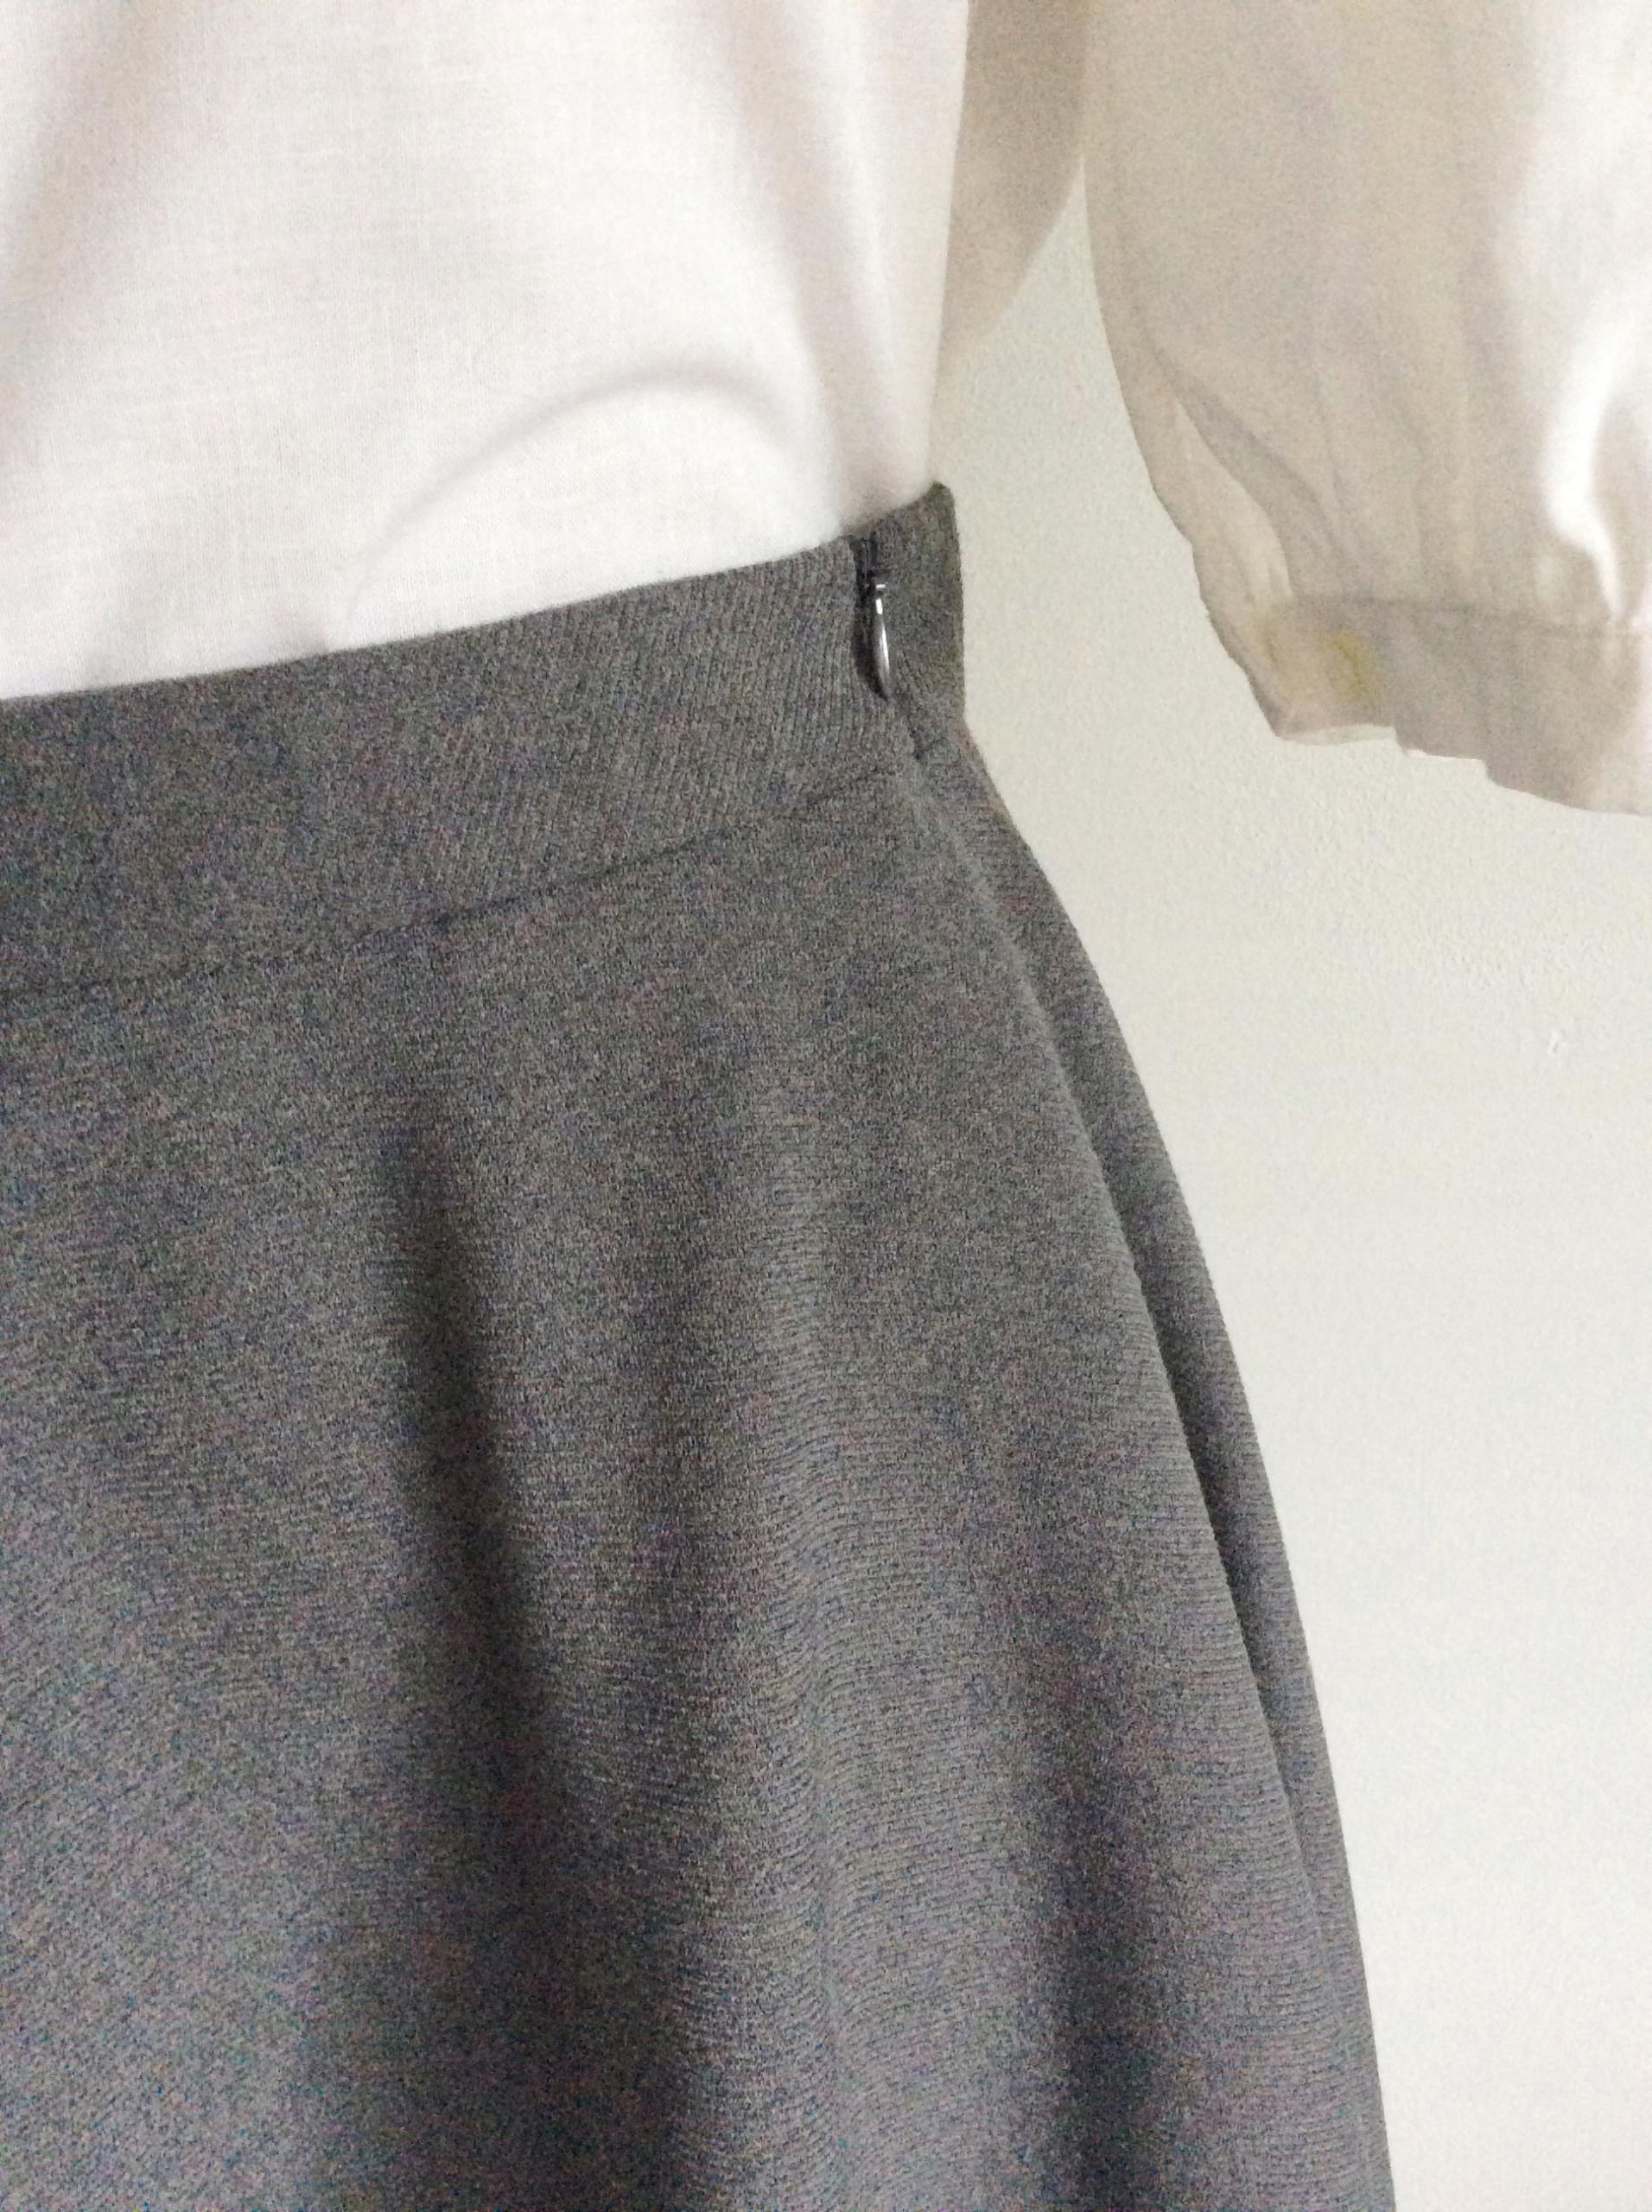 c95e150c92a577 Szara retro spódnica w stylu lat 50 Mohito - 7691797212 - oficjalne ...